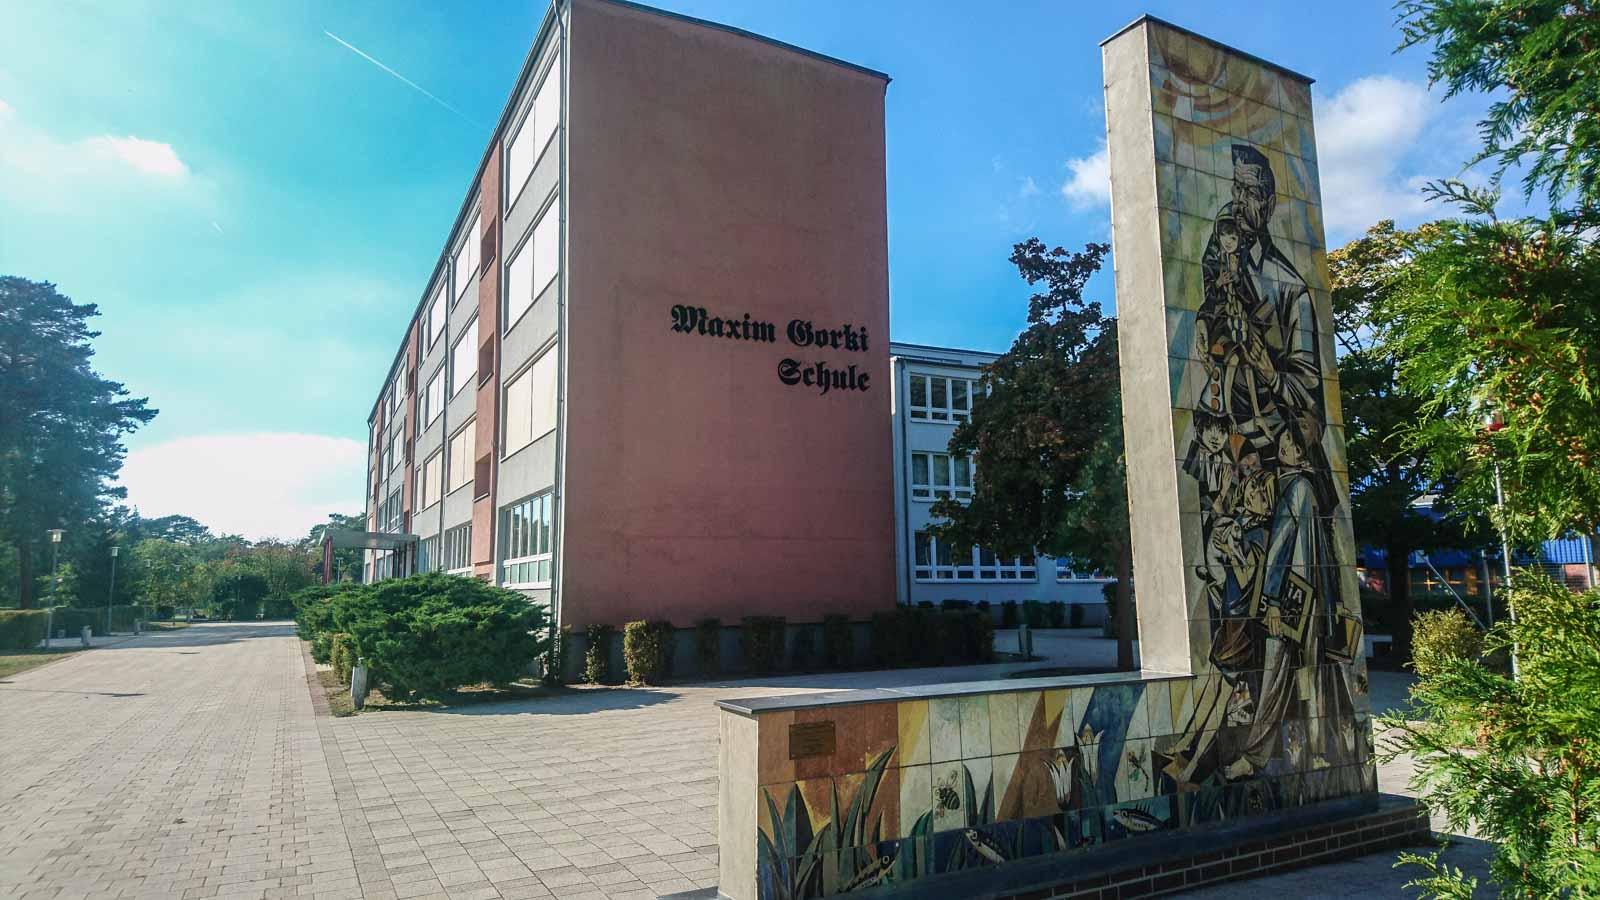 Maxim Gorki Schule Bad Saarow